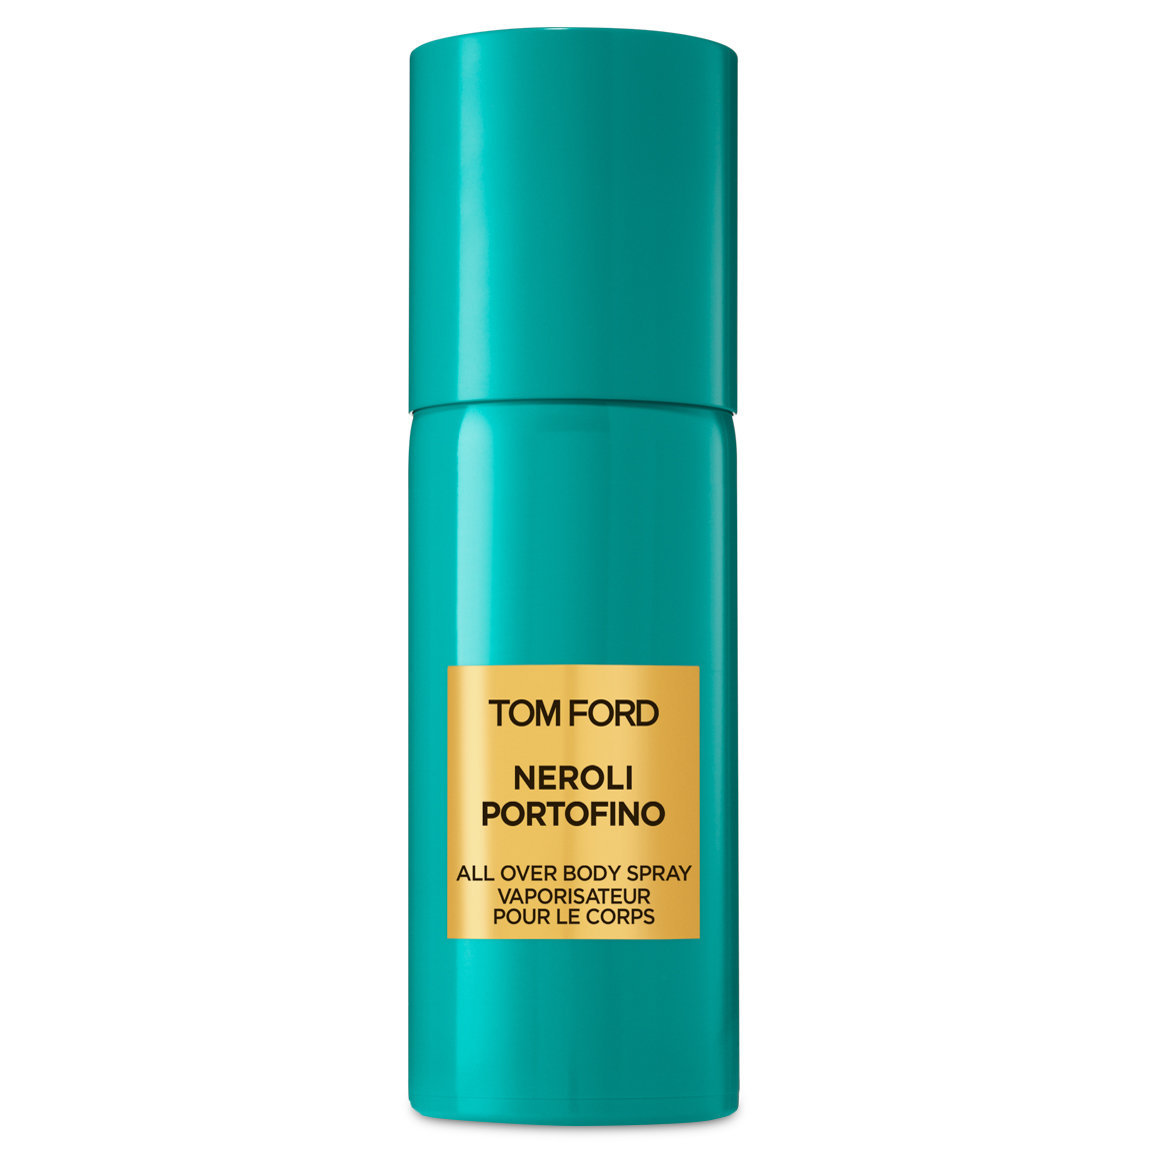 TOM FORD Neroli Portofino All Over Body Spray alternative view 1 - product swatch.